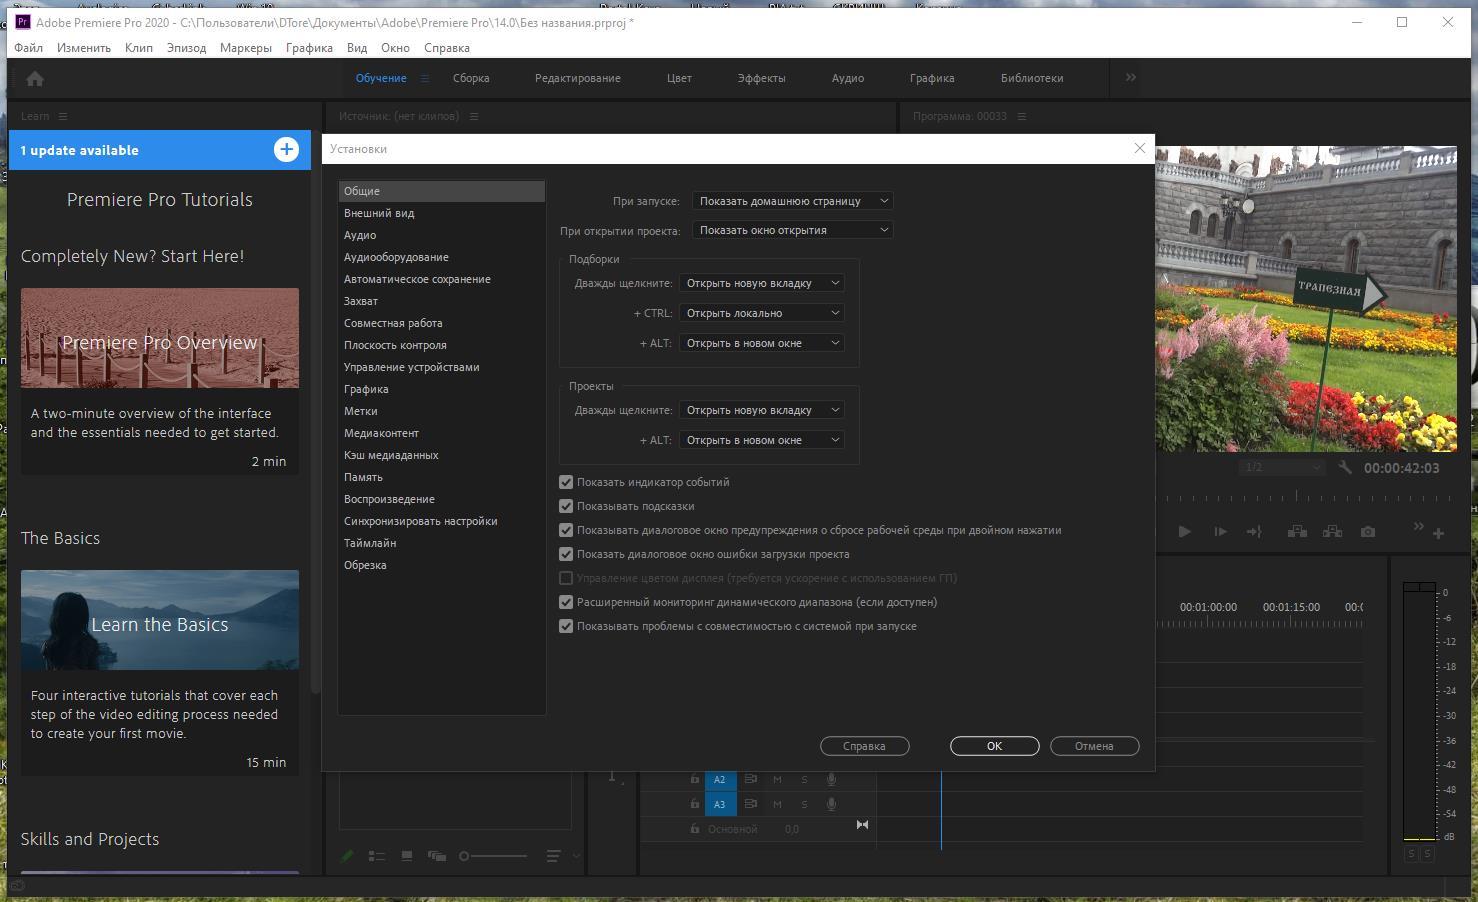 Adobe Premiere Pro 2020 14.0.4.18 RePack|Программы для WIDOWS 7,8,10